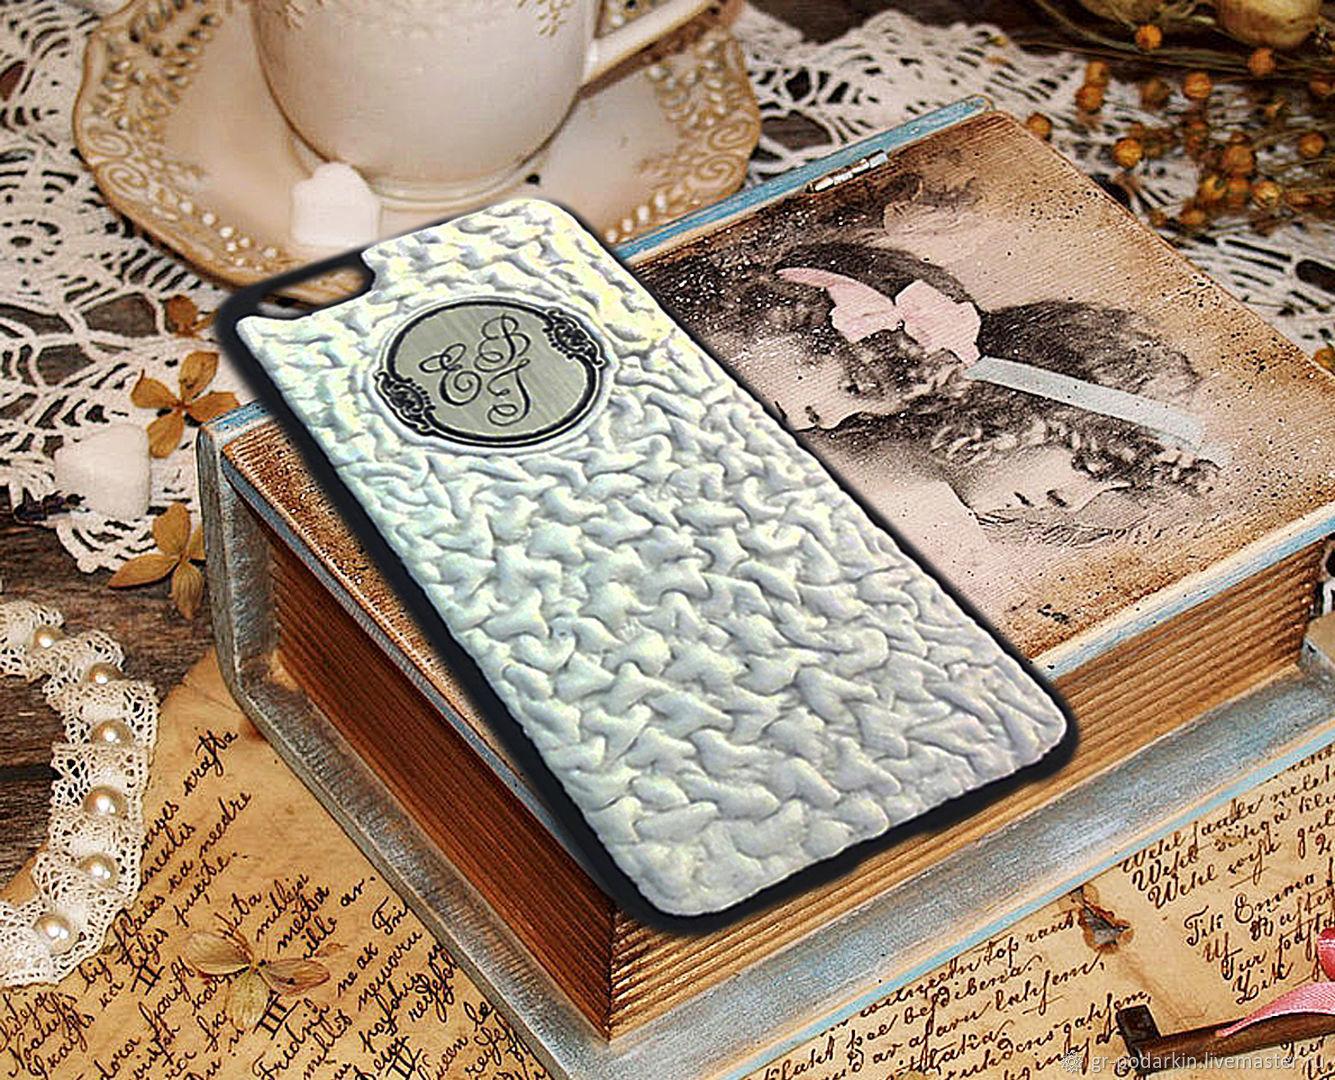 Bumper on phone leather case for iphone 6 7 8 x xr samsung xiaomi, Case, Essentuki,  Фото №1